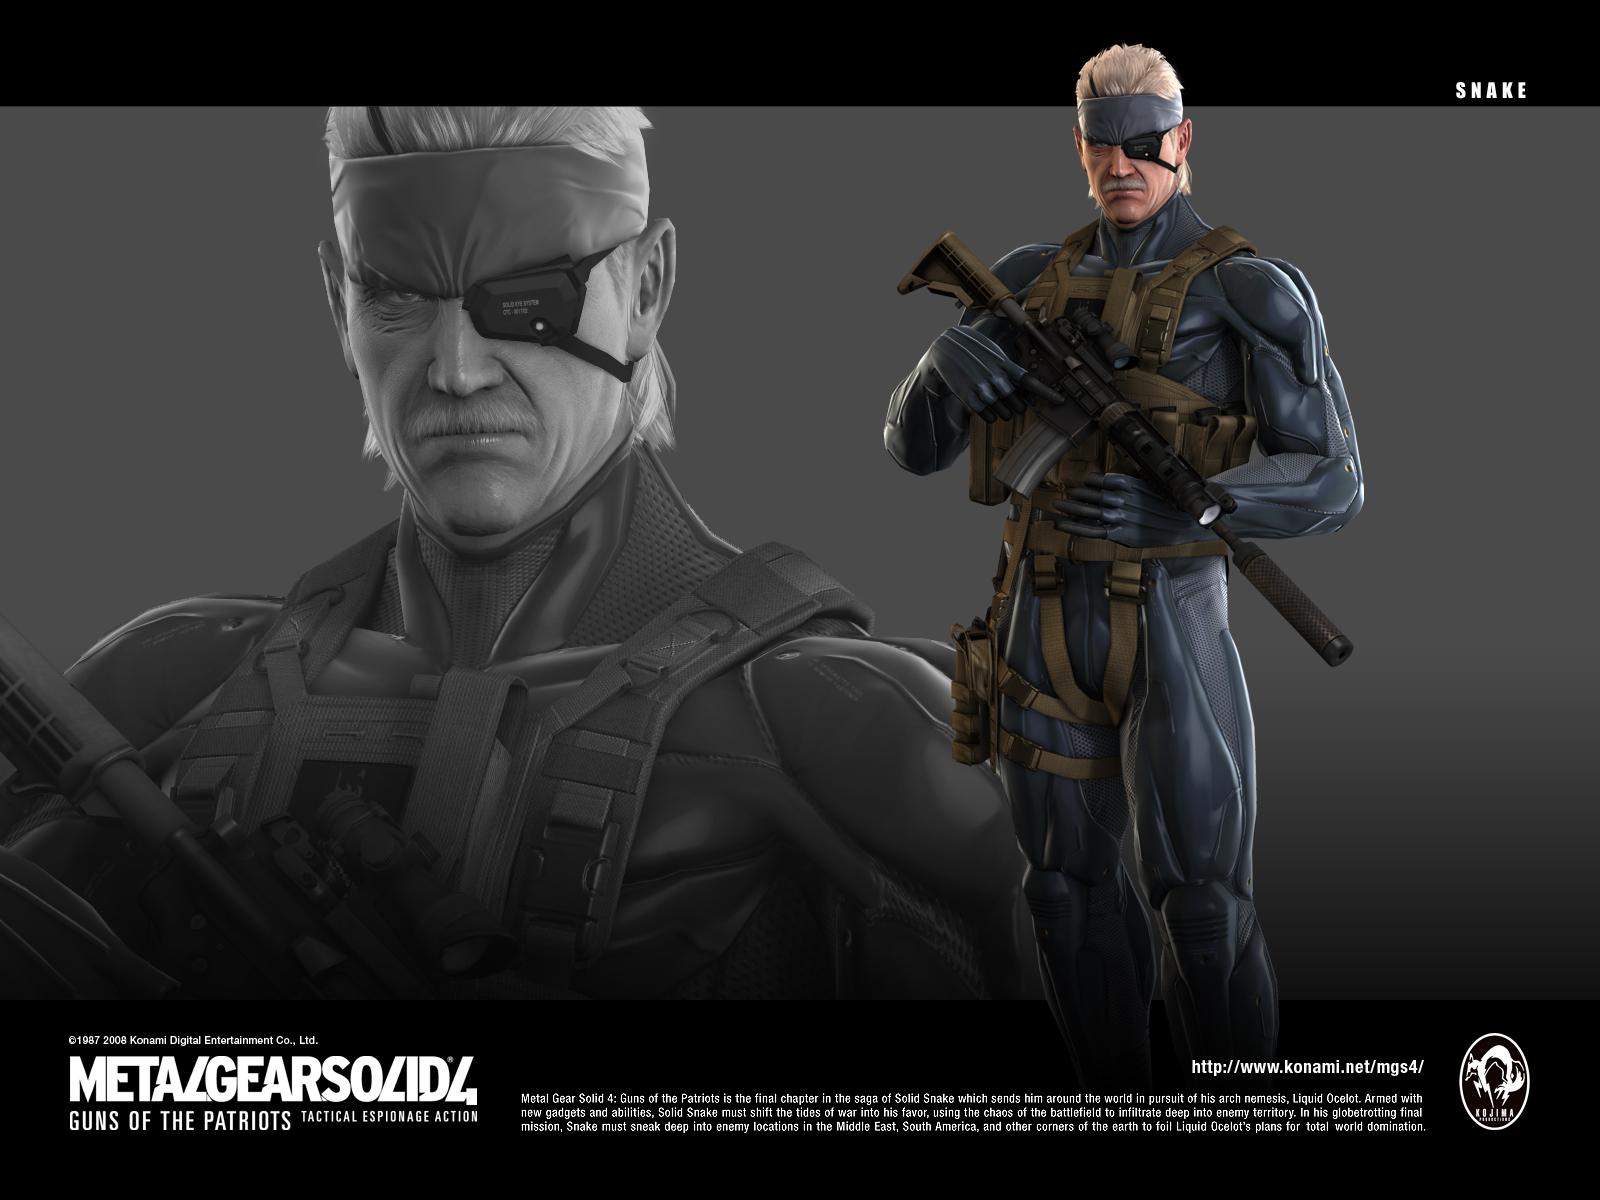 Metal Gear Solid Artbook